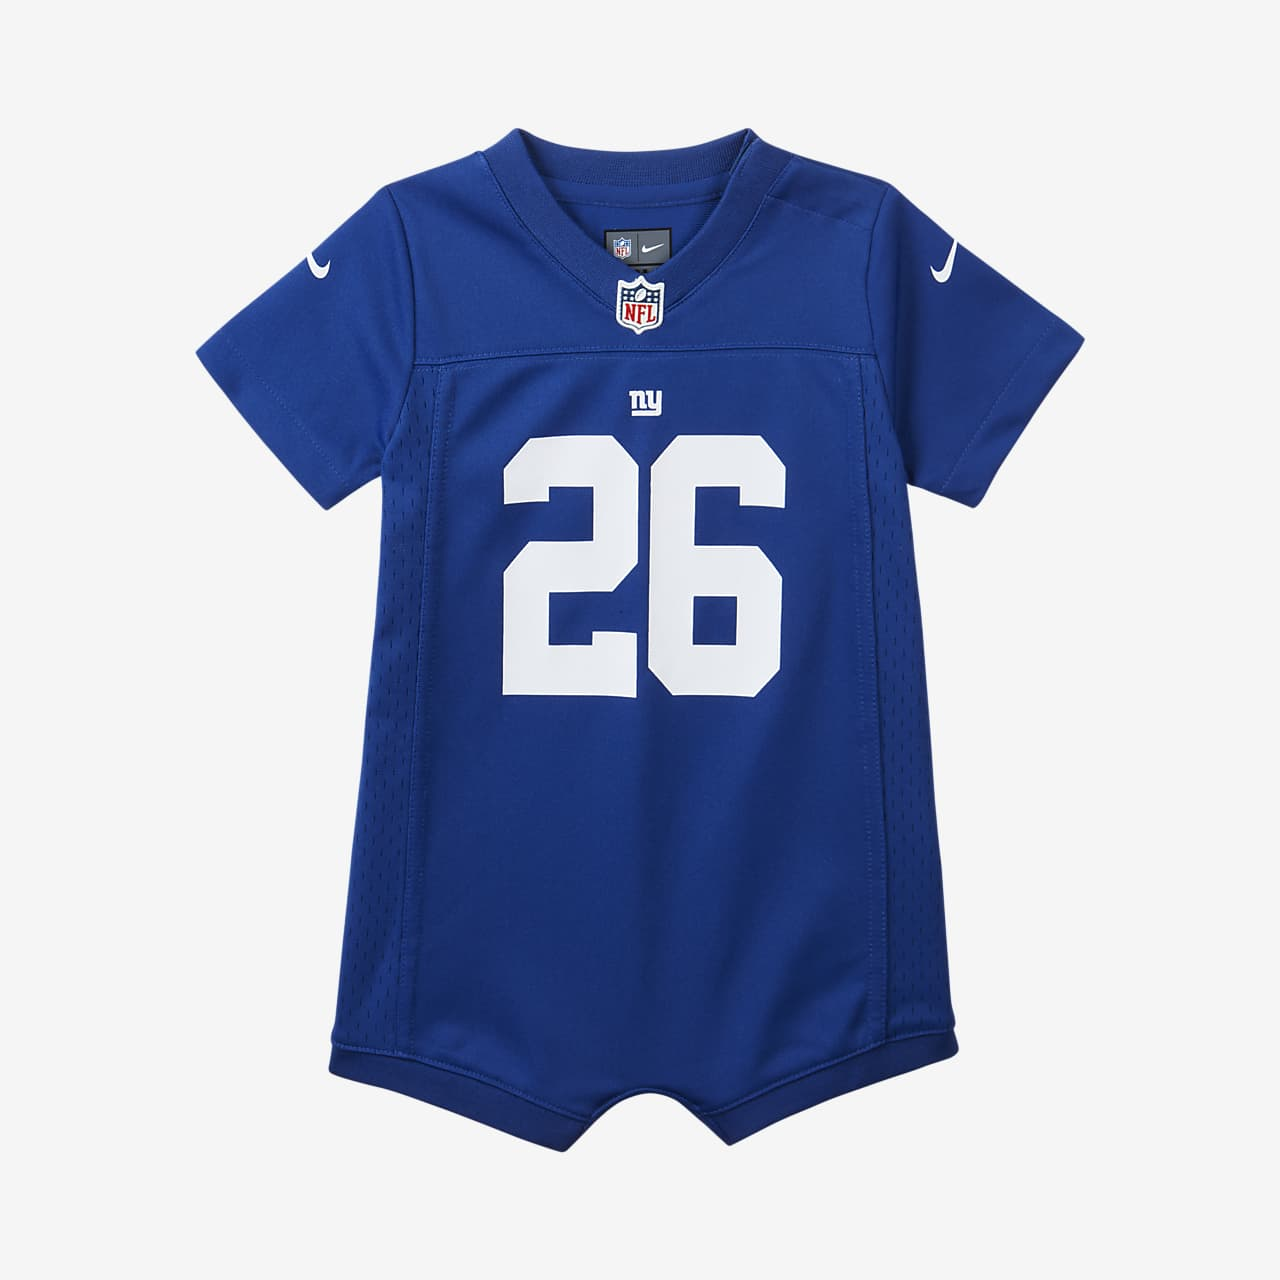 Macacão NFL New York Giants (Saquon Barkley) para bebé